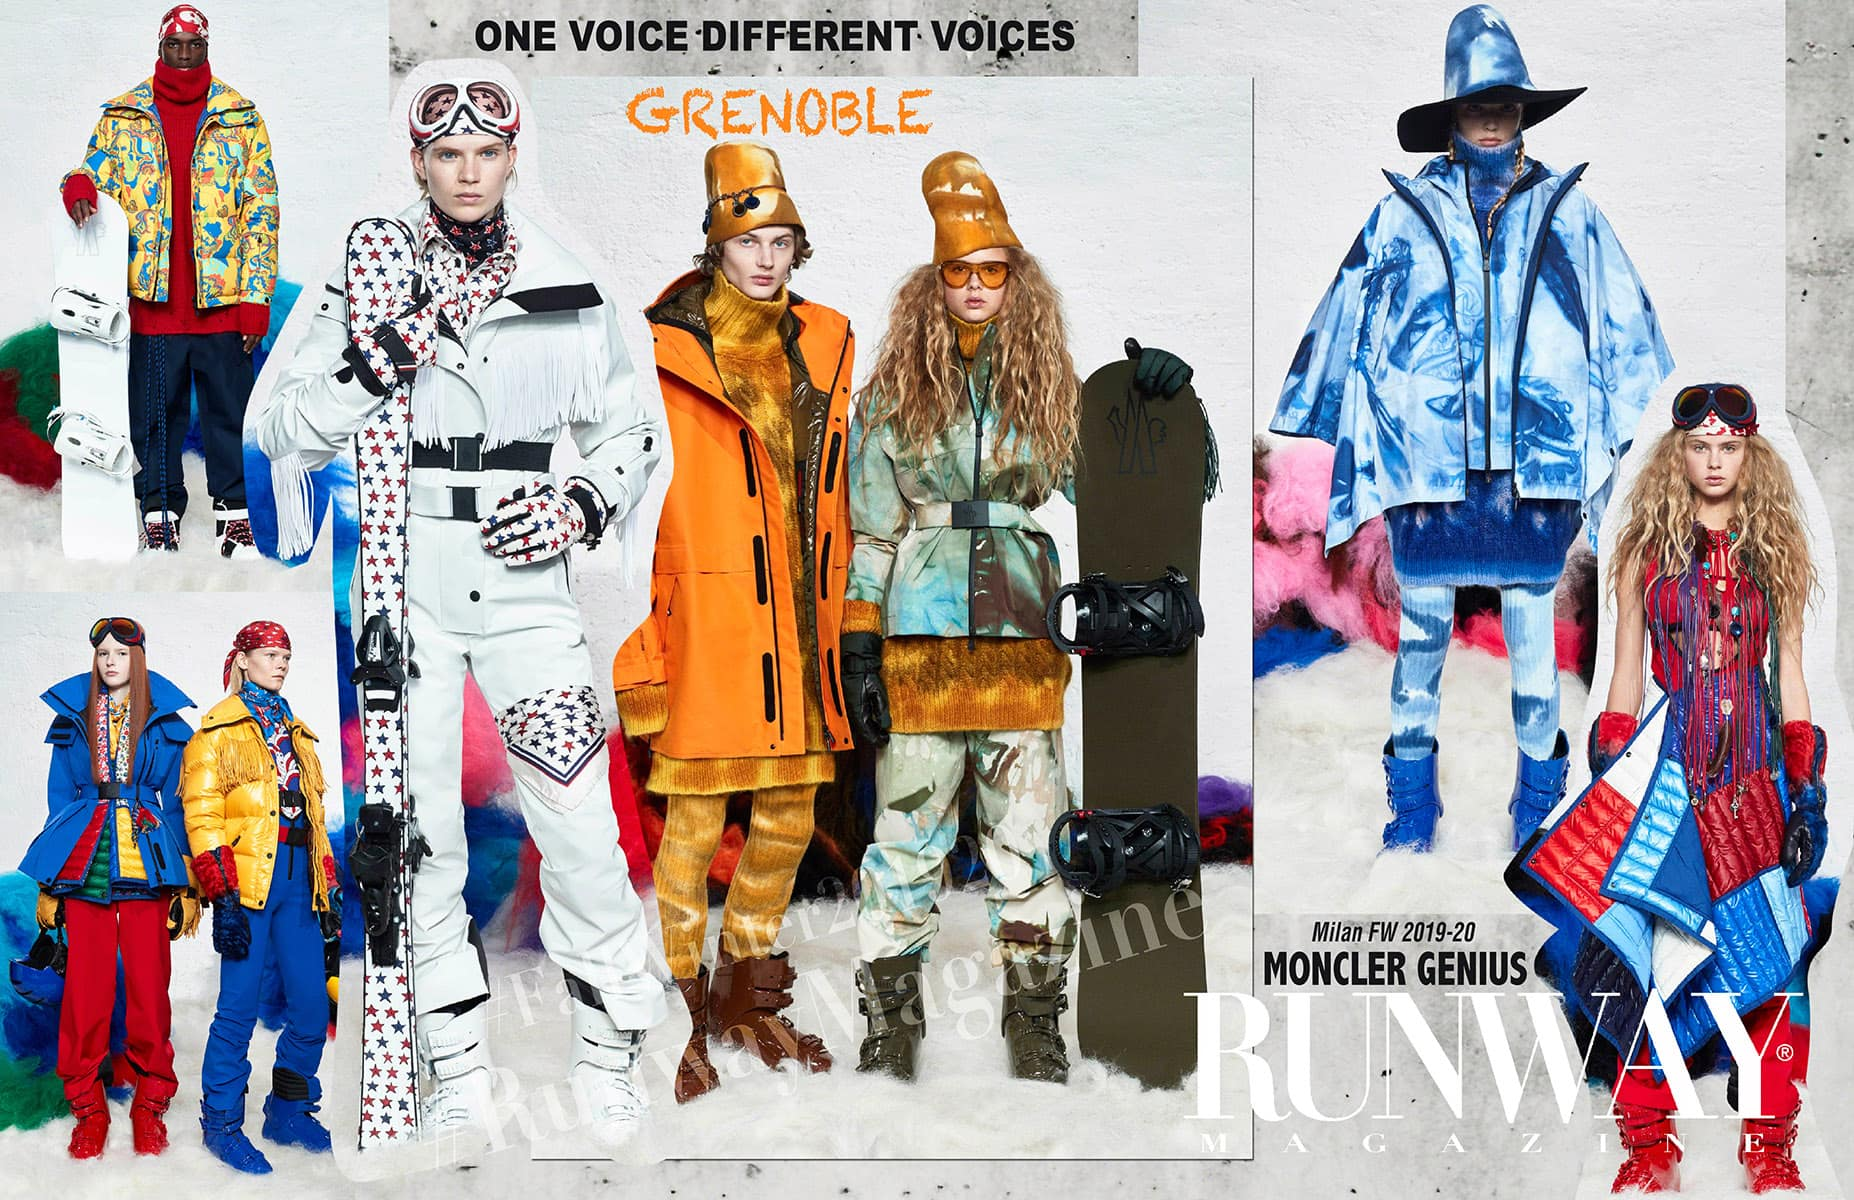 Moncler Genius Fall-Winter 2019-2020 Milan - Designer Grenoble by Runway Magazine